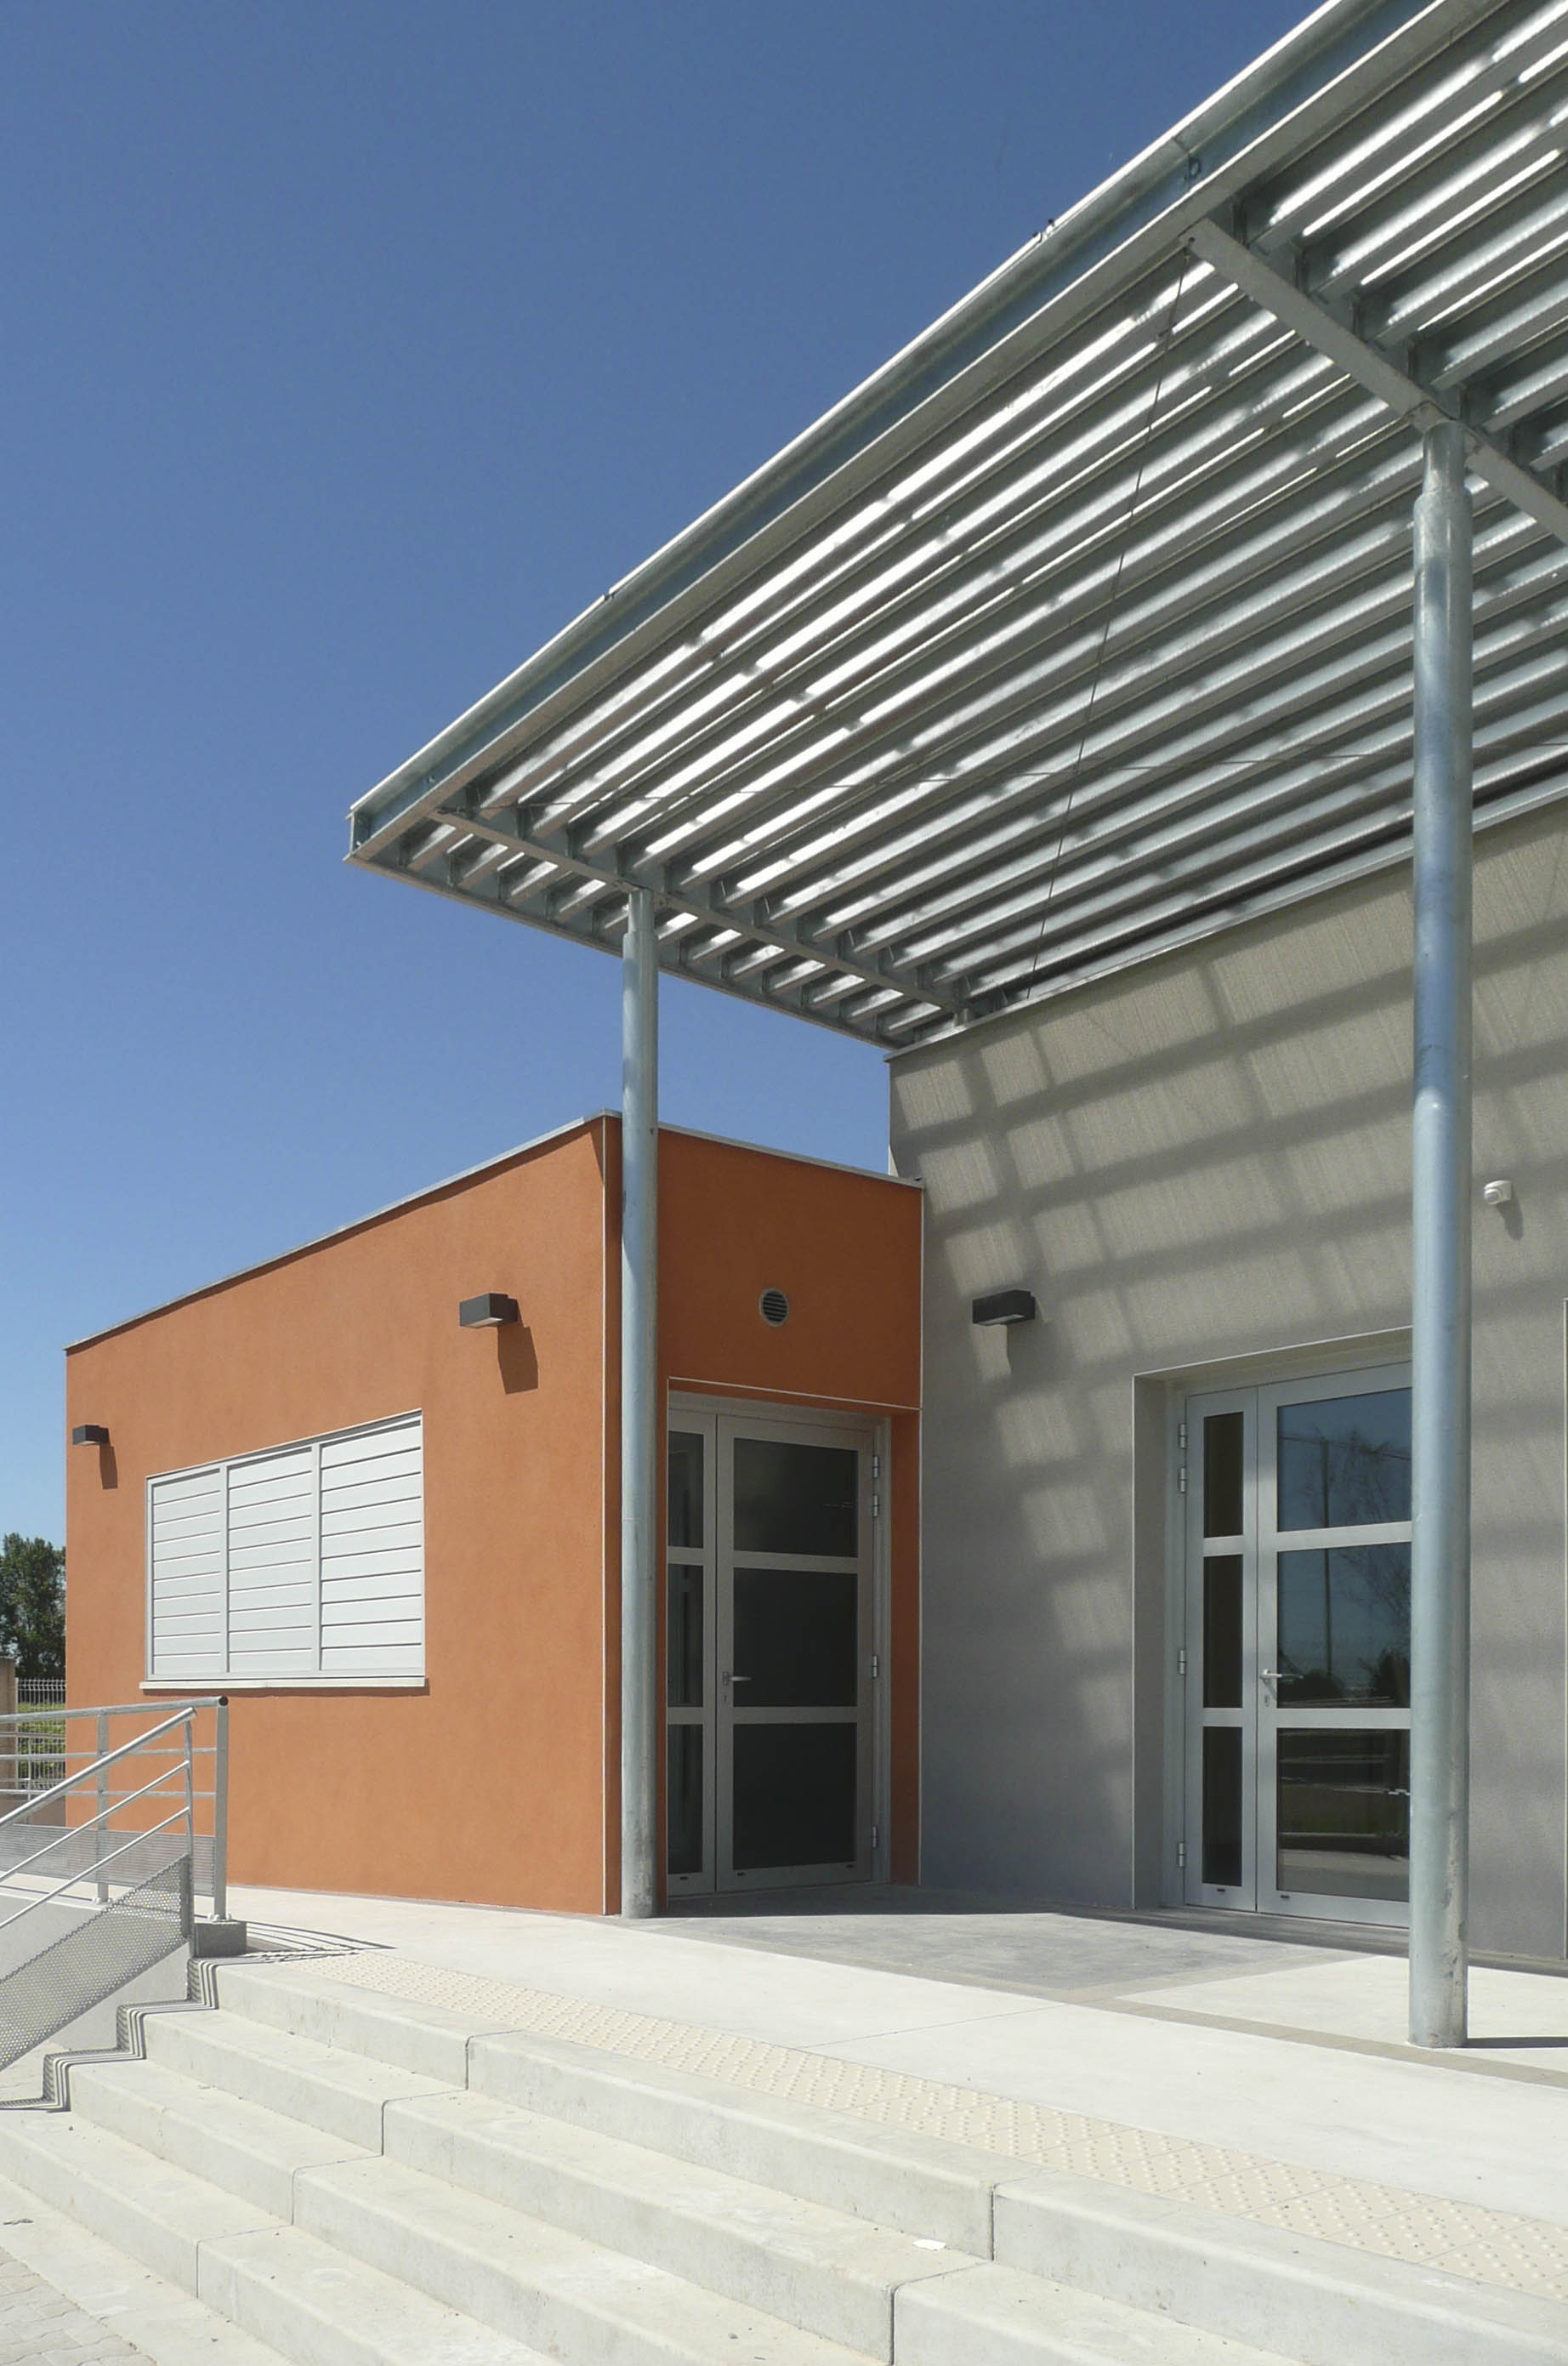 Club House salle polyvalente Hérault BF architecture 5